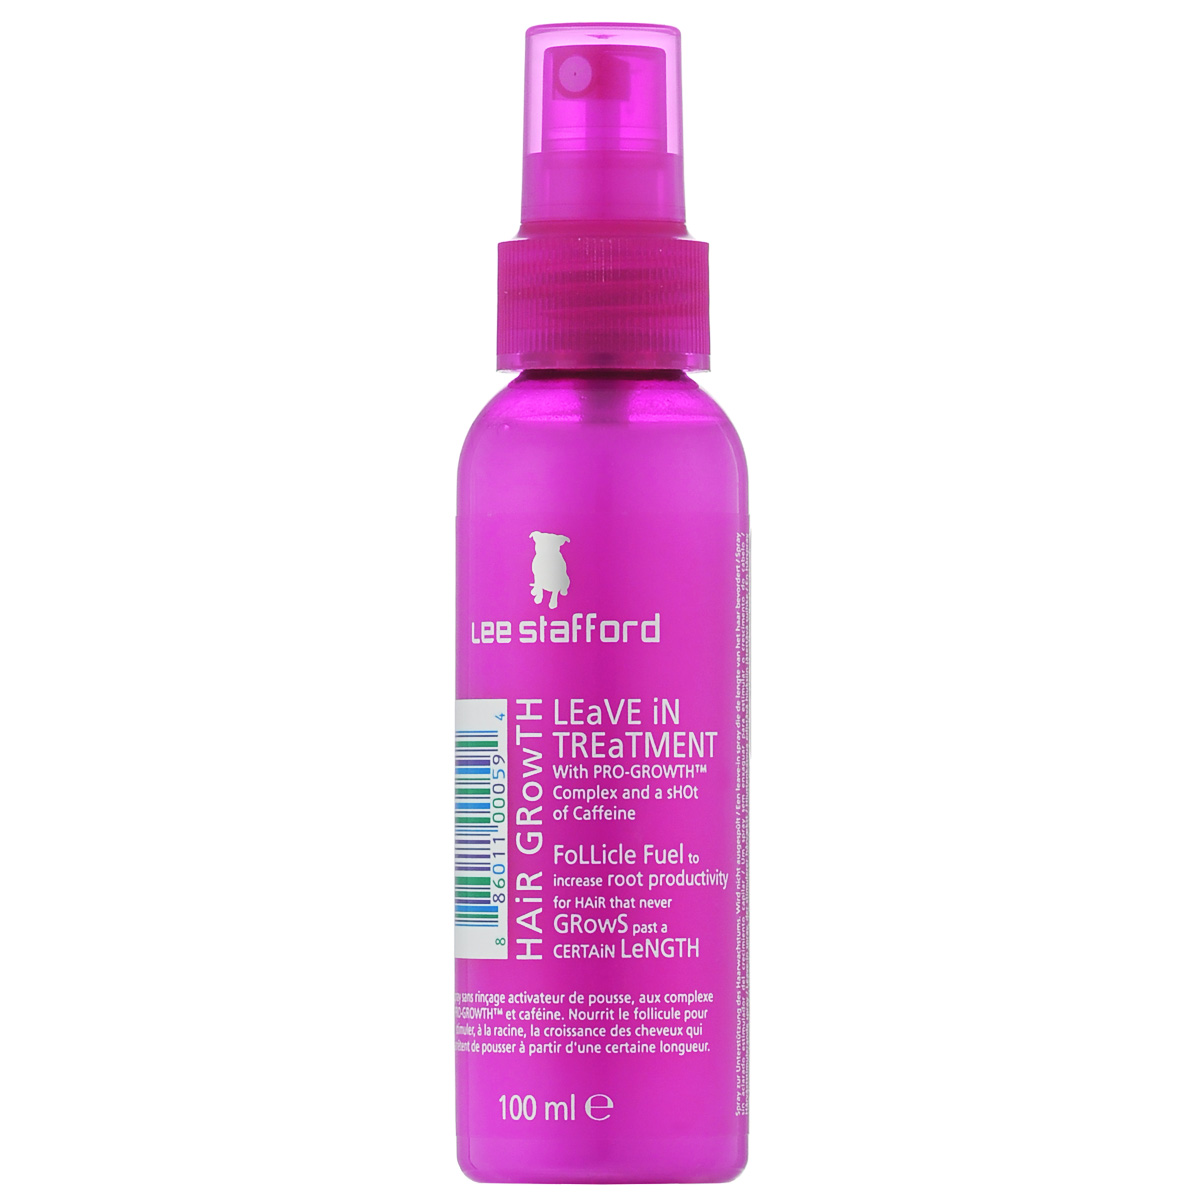 Lee Stafford Сыворотка для роста волос Hair Growth, 100 мл шампунь для волос lee stafford hair growth shampoo 200 мл